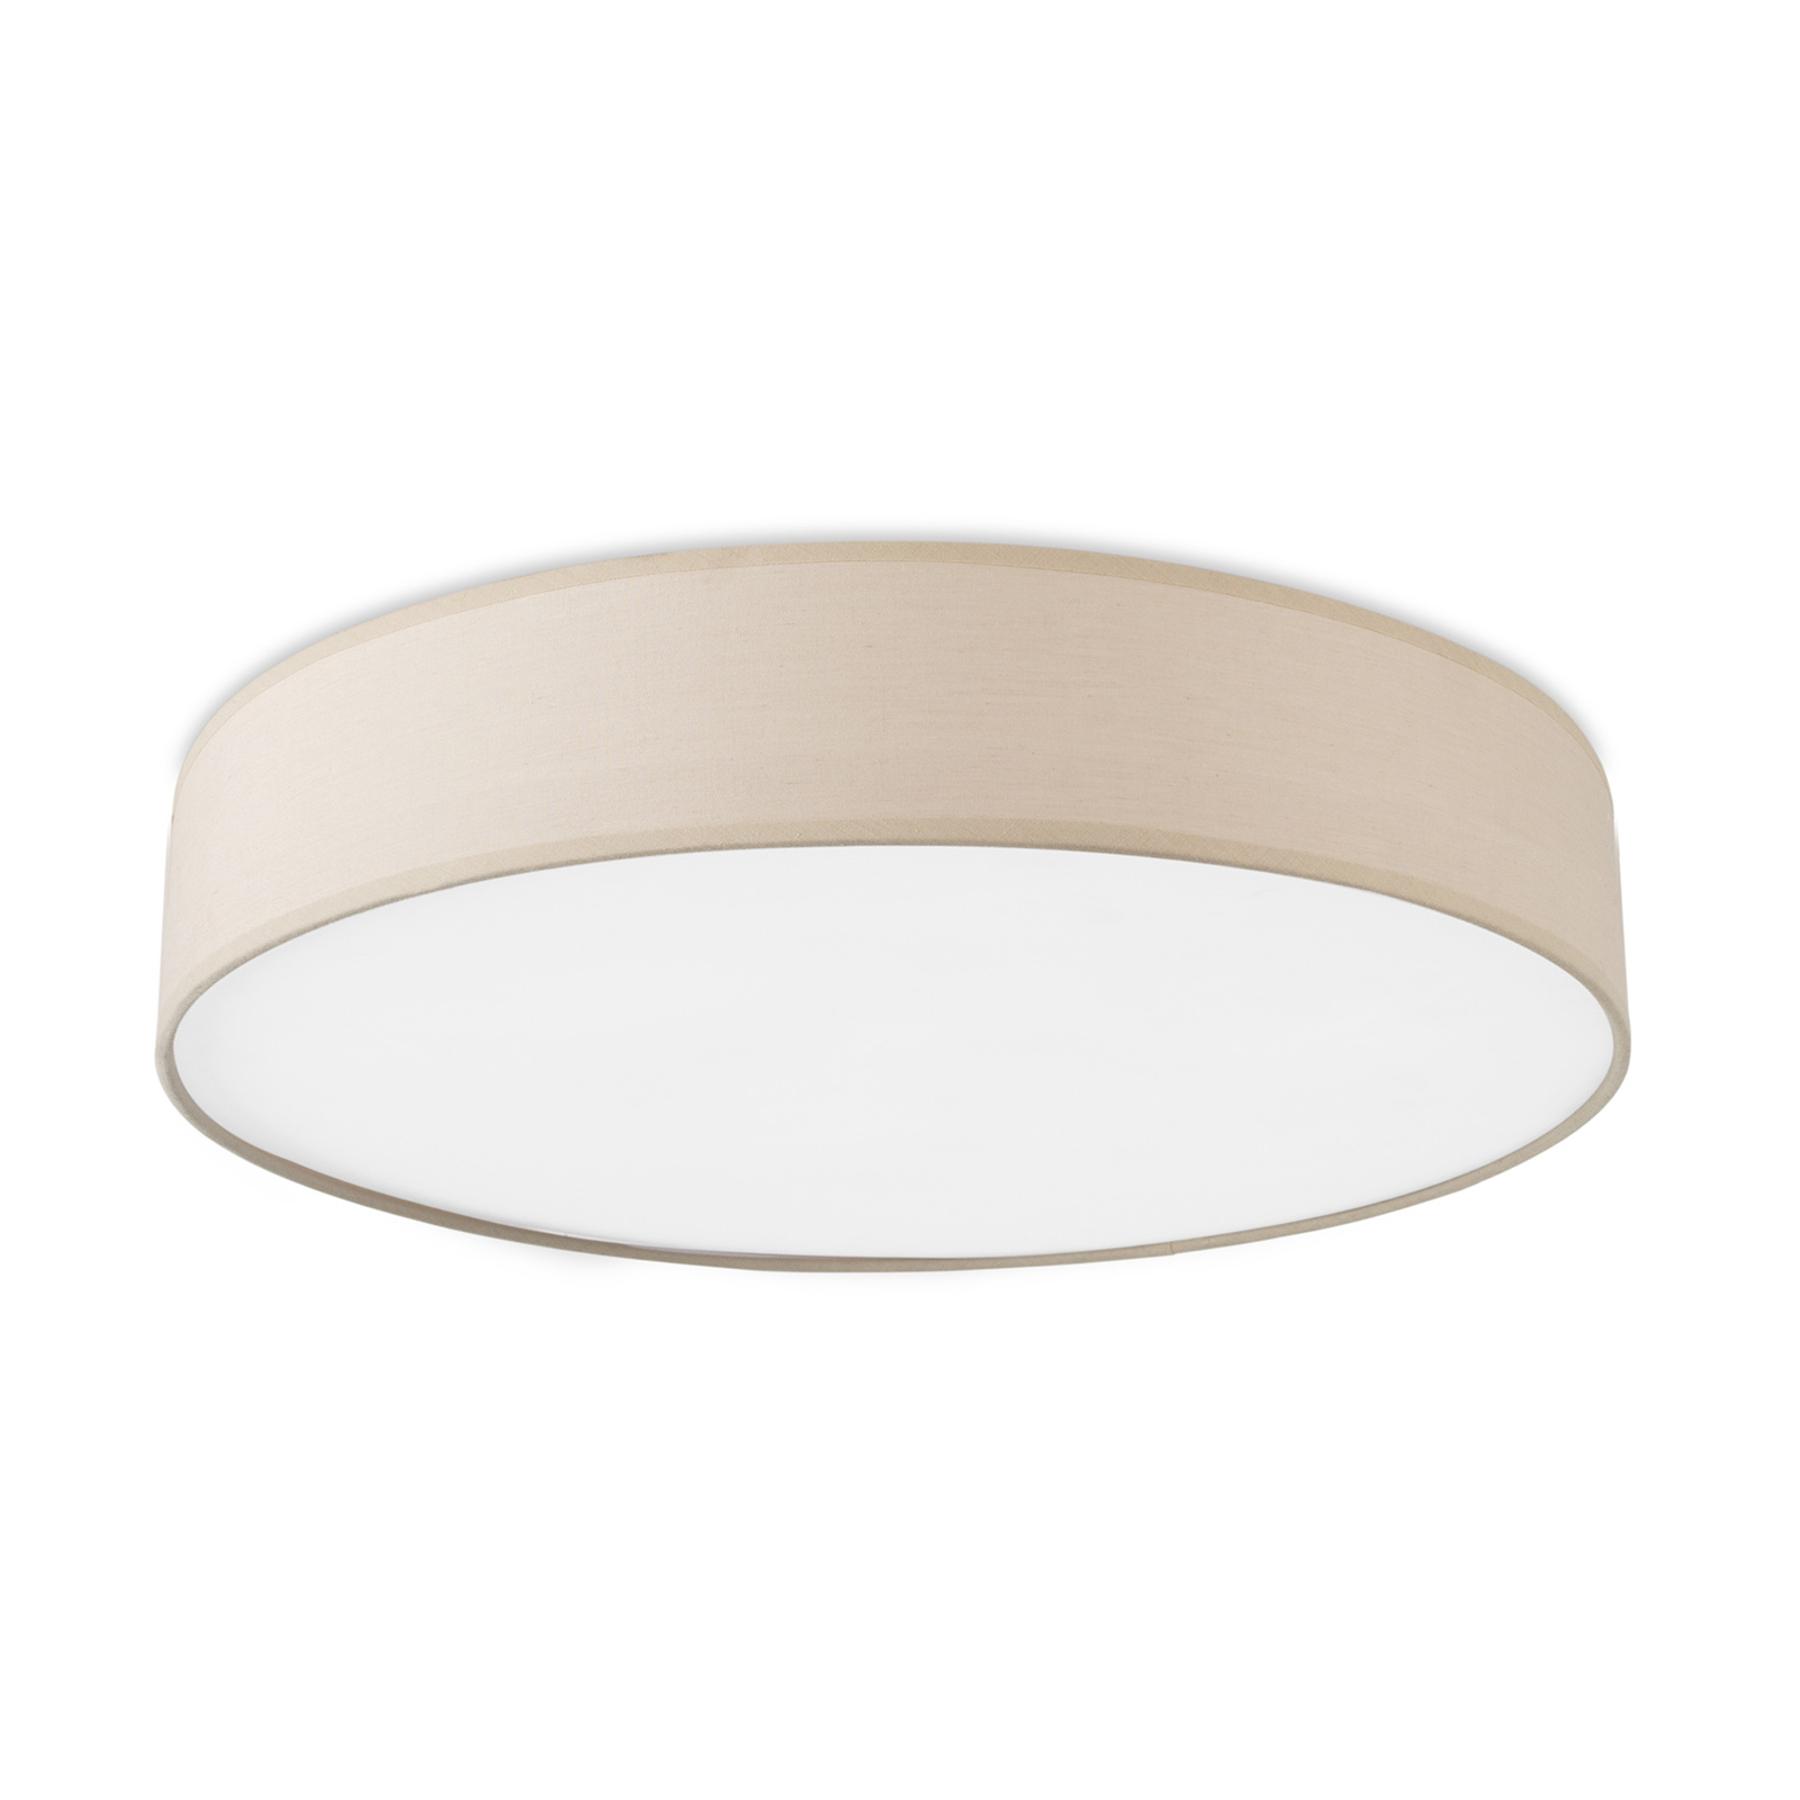 LEDS-C4 Bol LED plafondlamp met stoffen kap